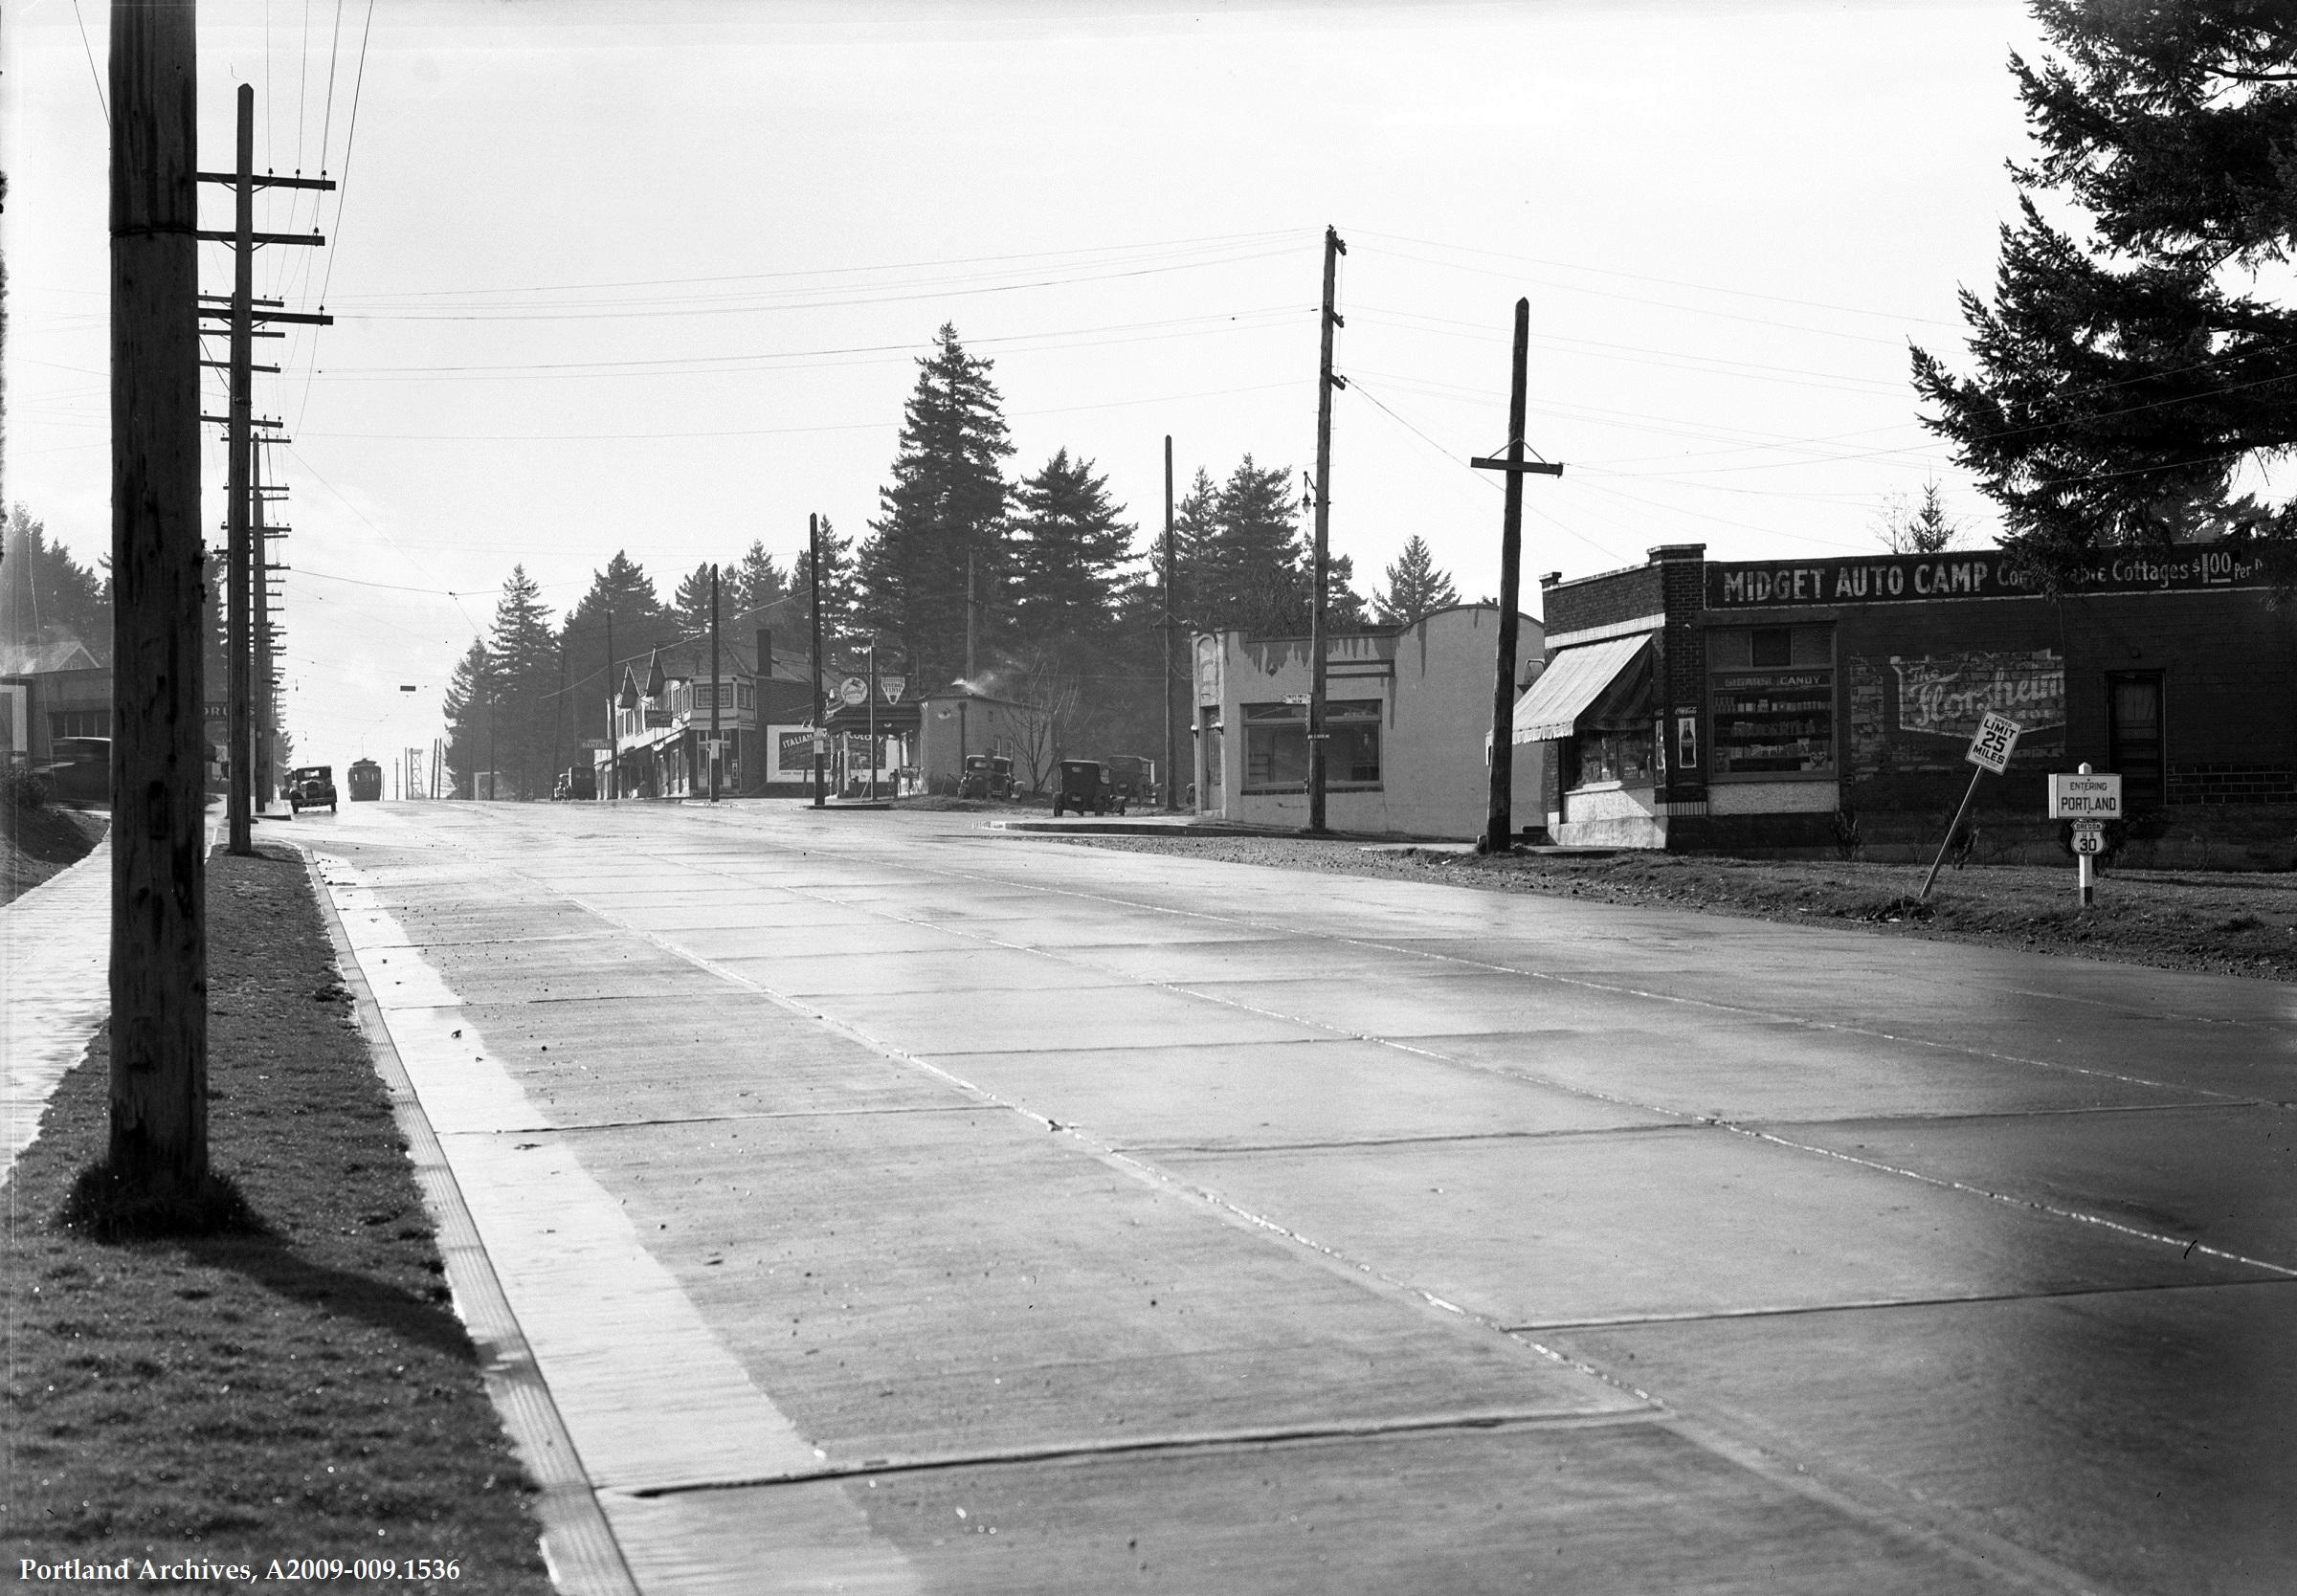 City of Portland Archives, Oregon, A2009-009.1536